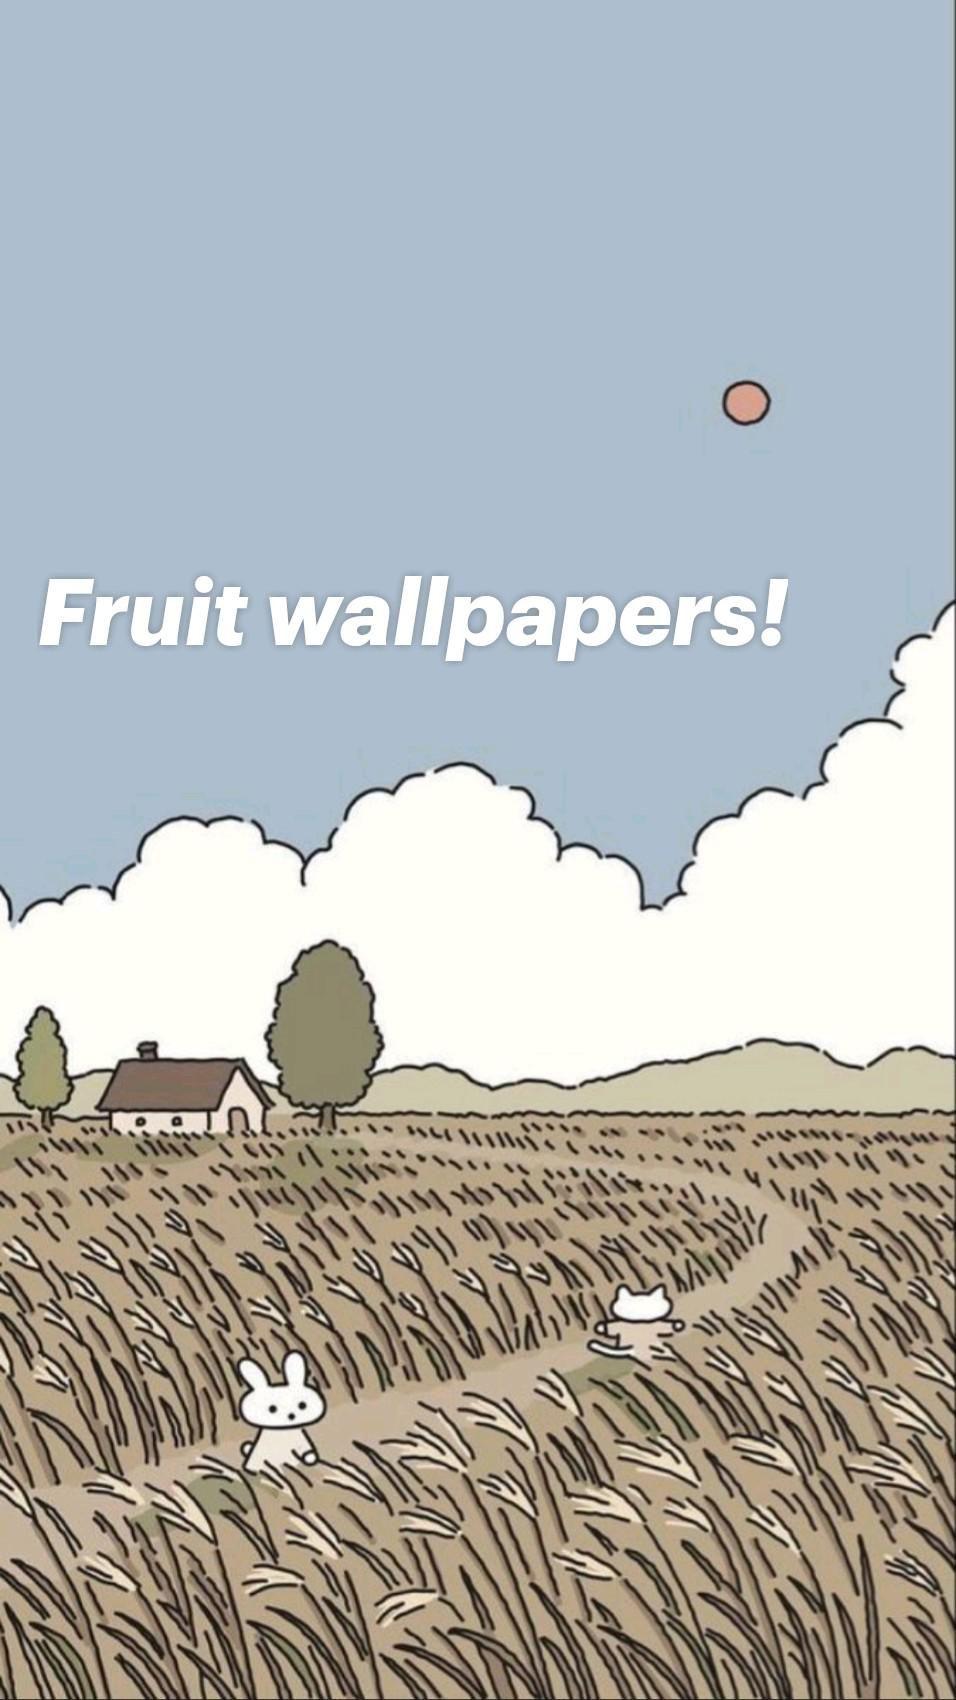 Fruit wallpapers!